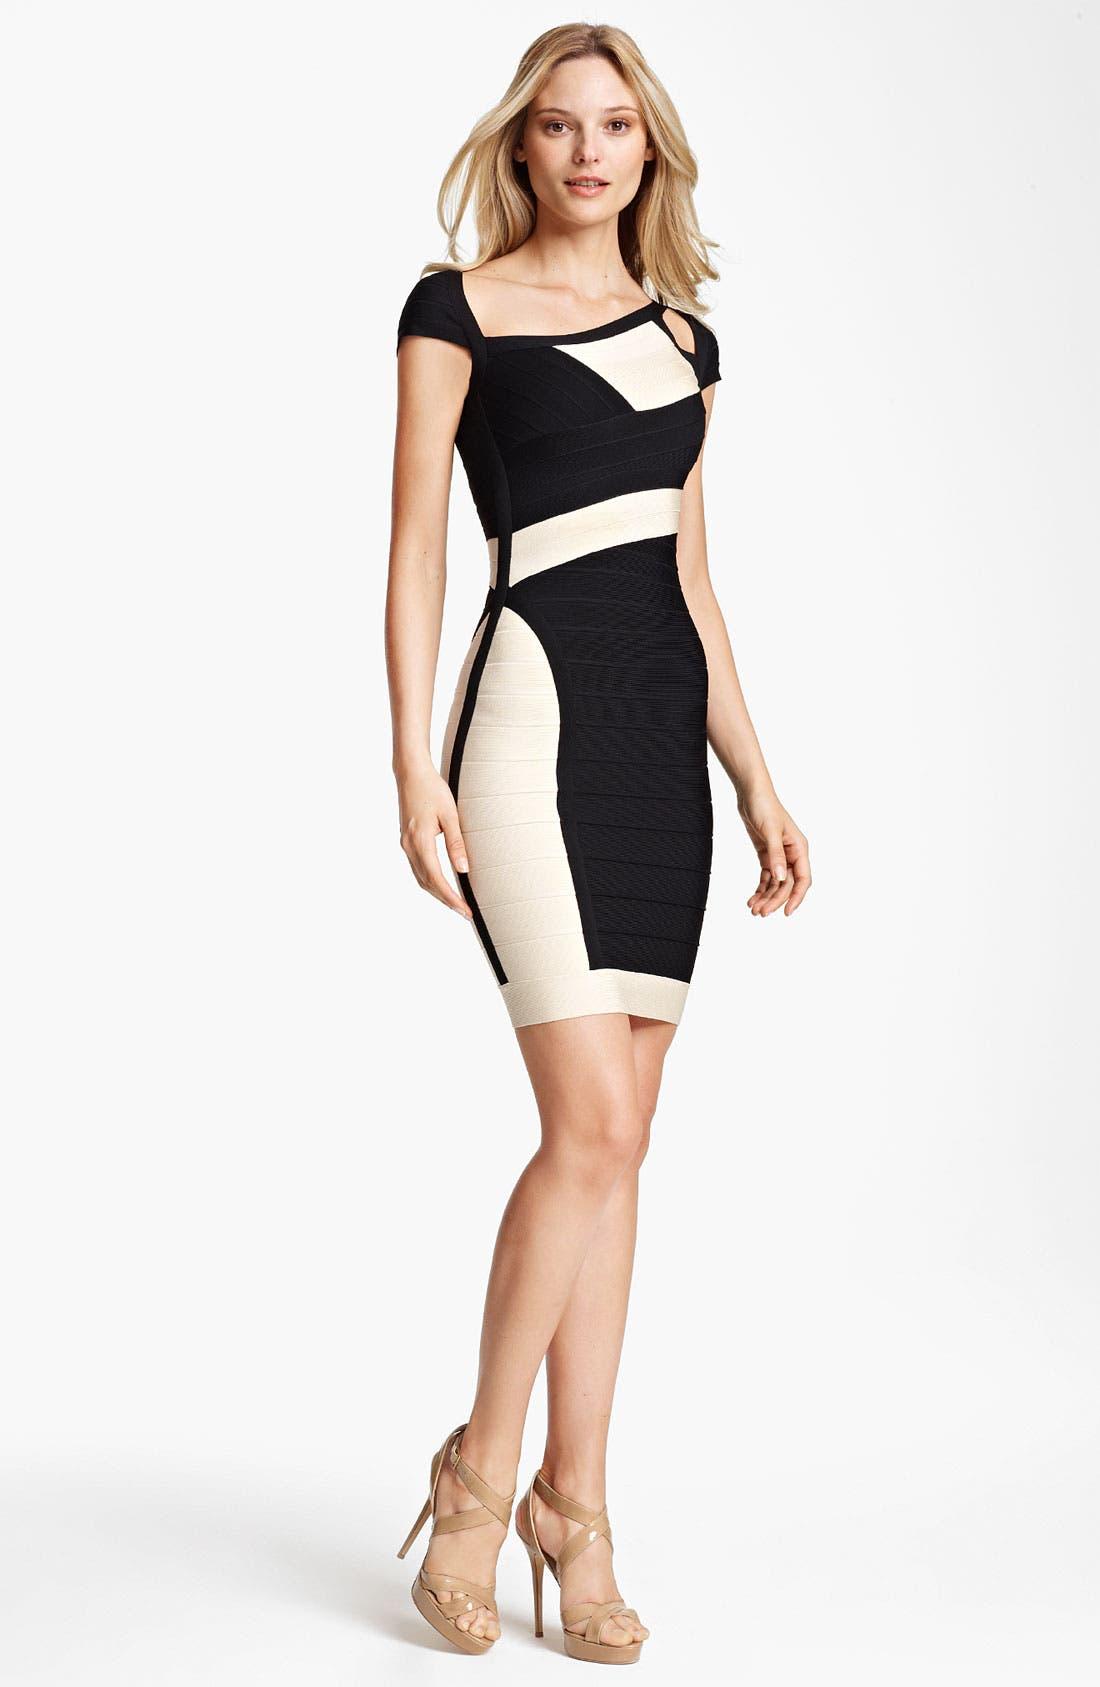 Alternate Image 1 Selected - Herve Leger Colorblock Cutout Bandage Dress